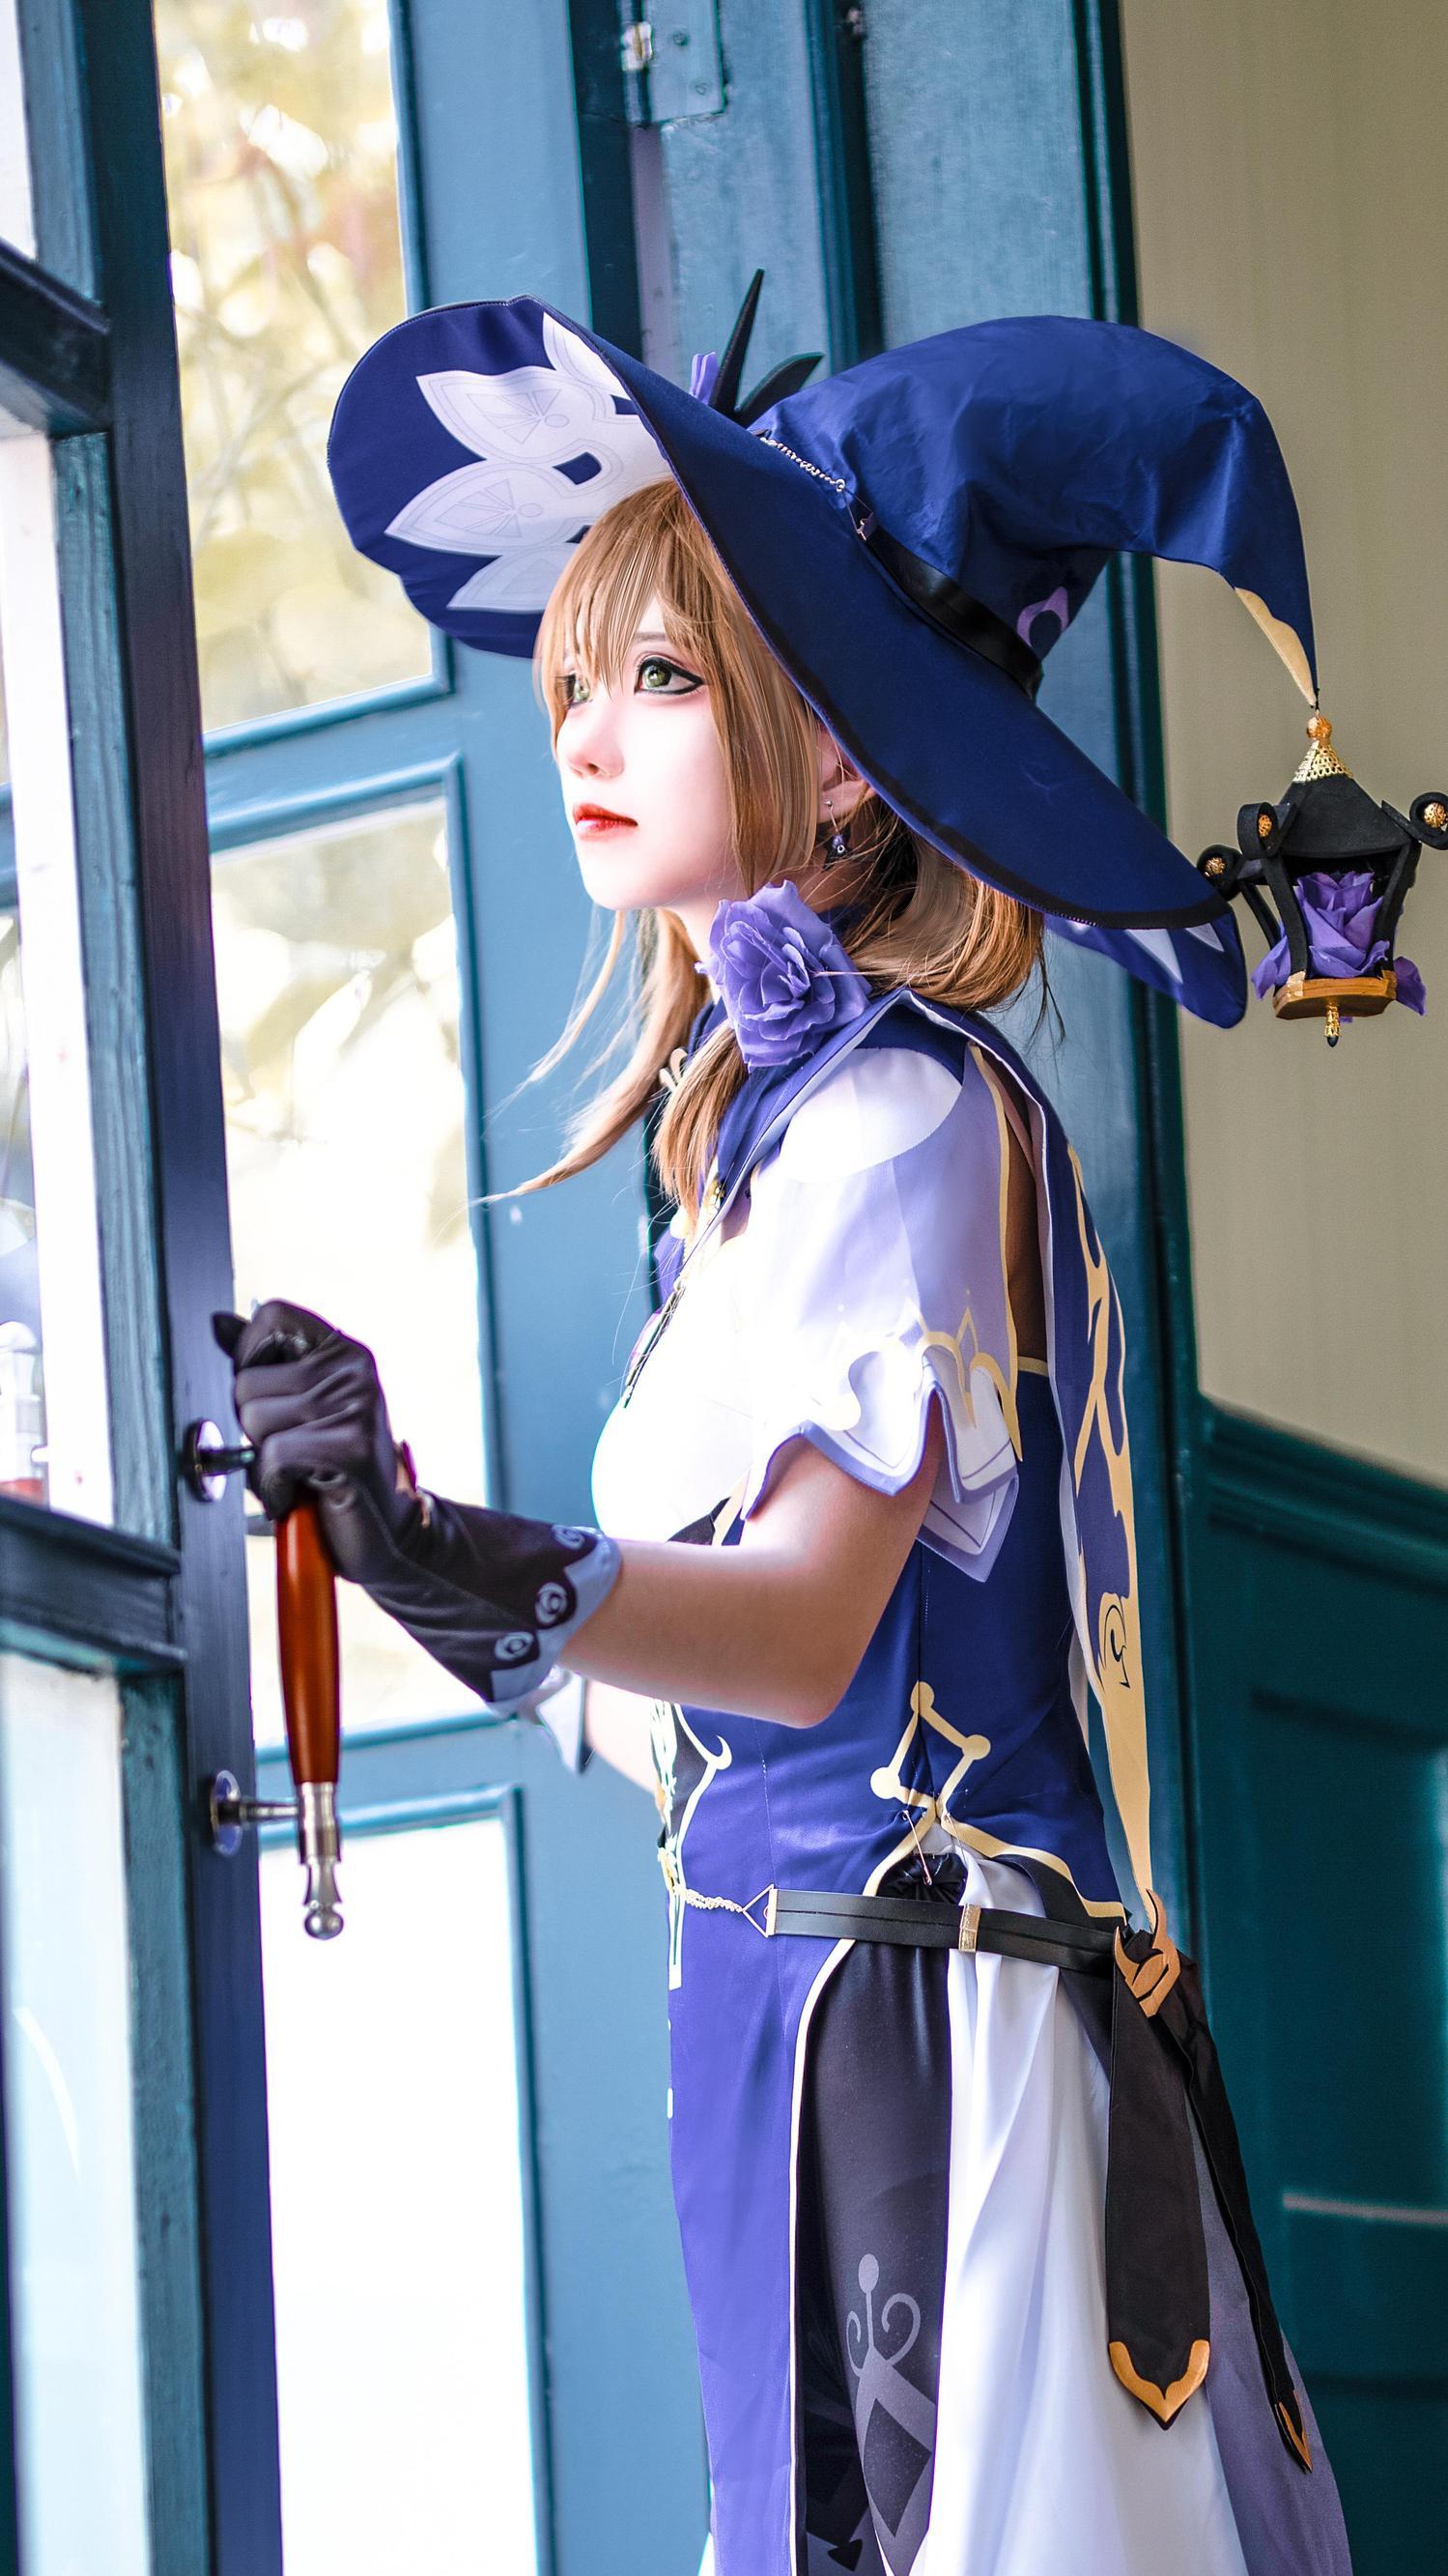 《原神》御姐cosplay【CN:南千鲤Akirui】-第5张